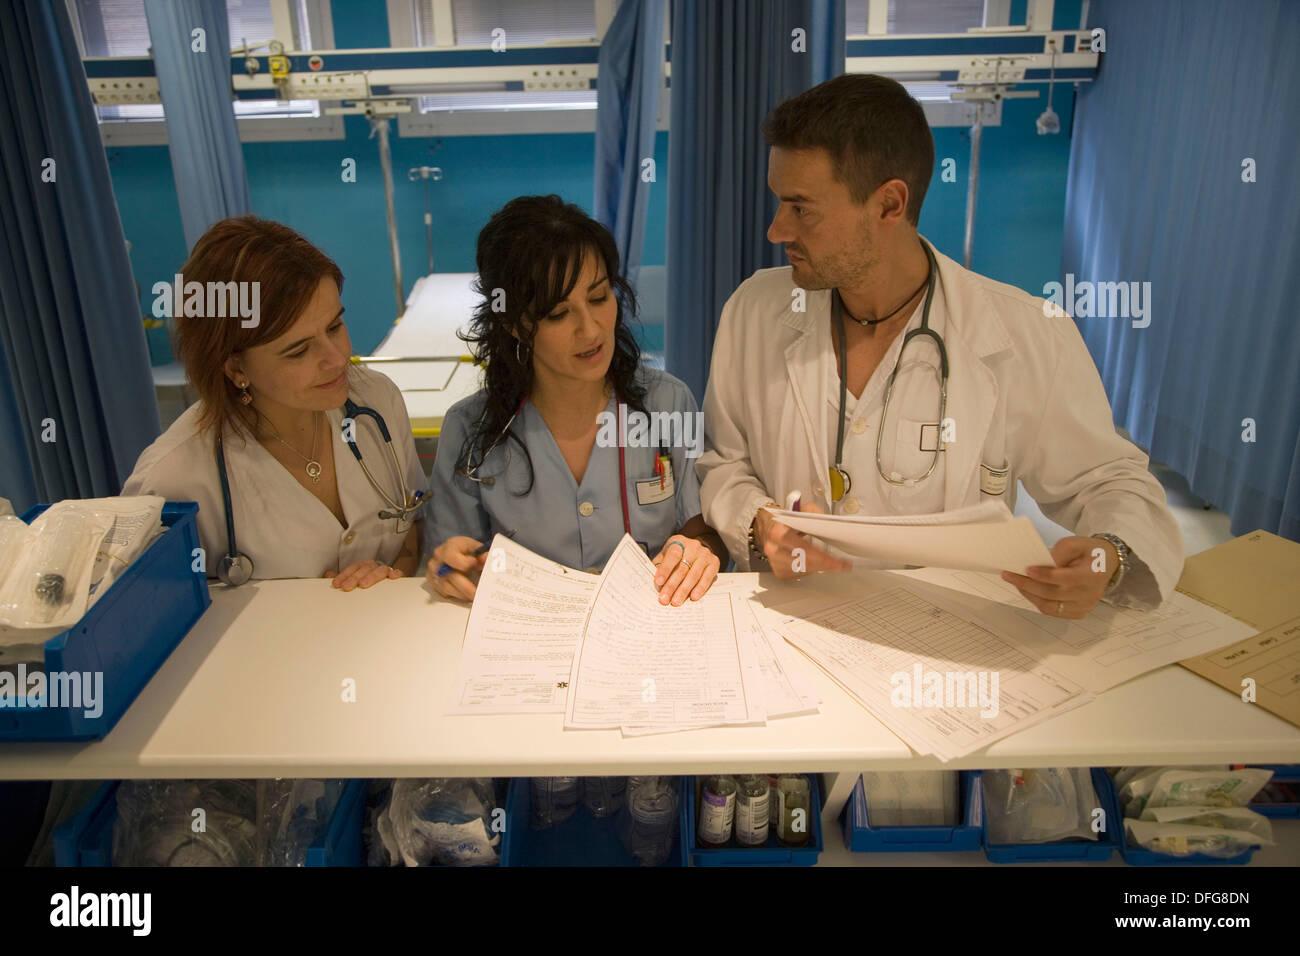 Reception Desk Emergency Room Hospital Stockfotos & Reception Desk ...